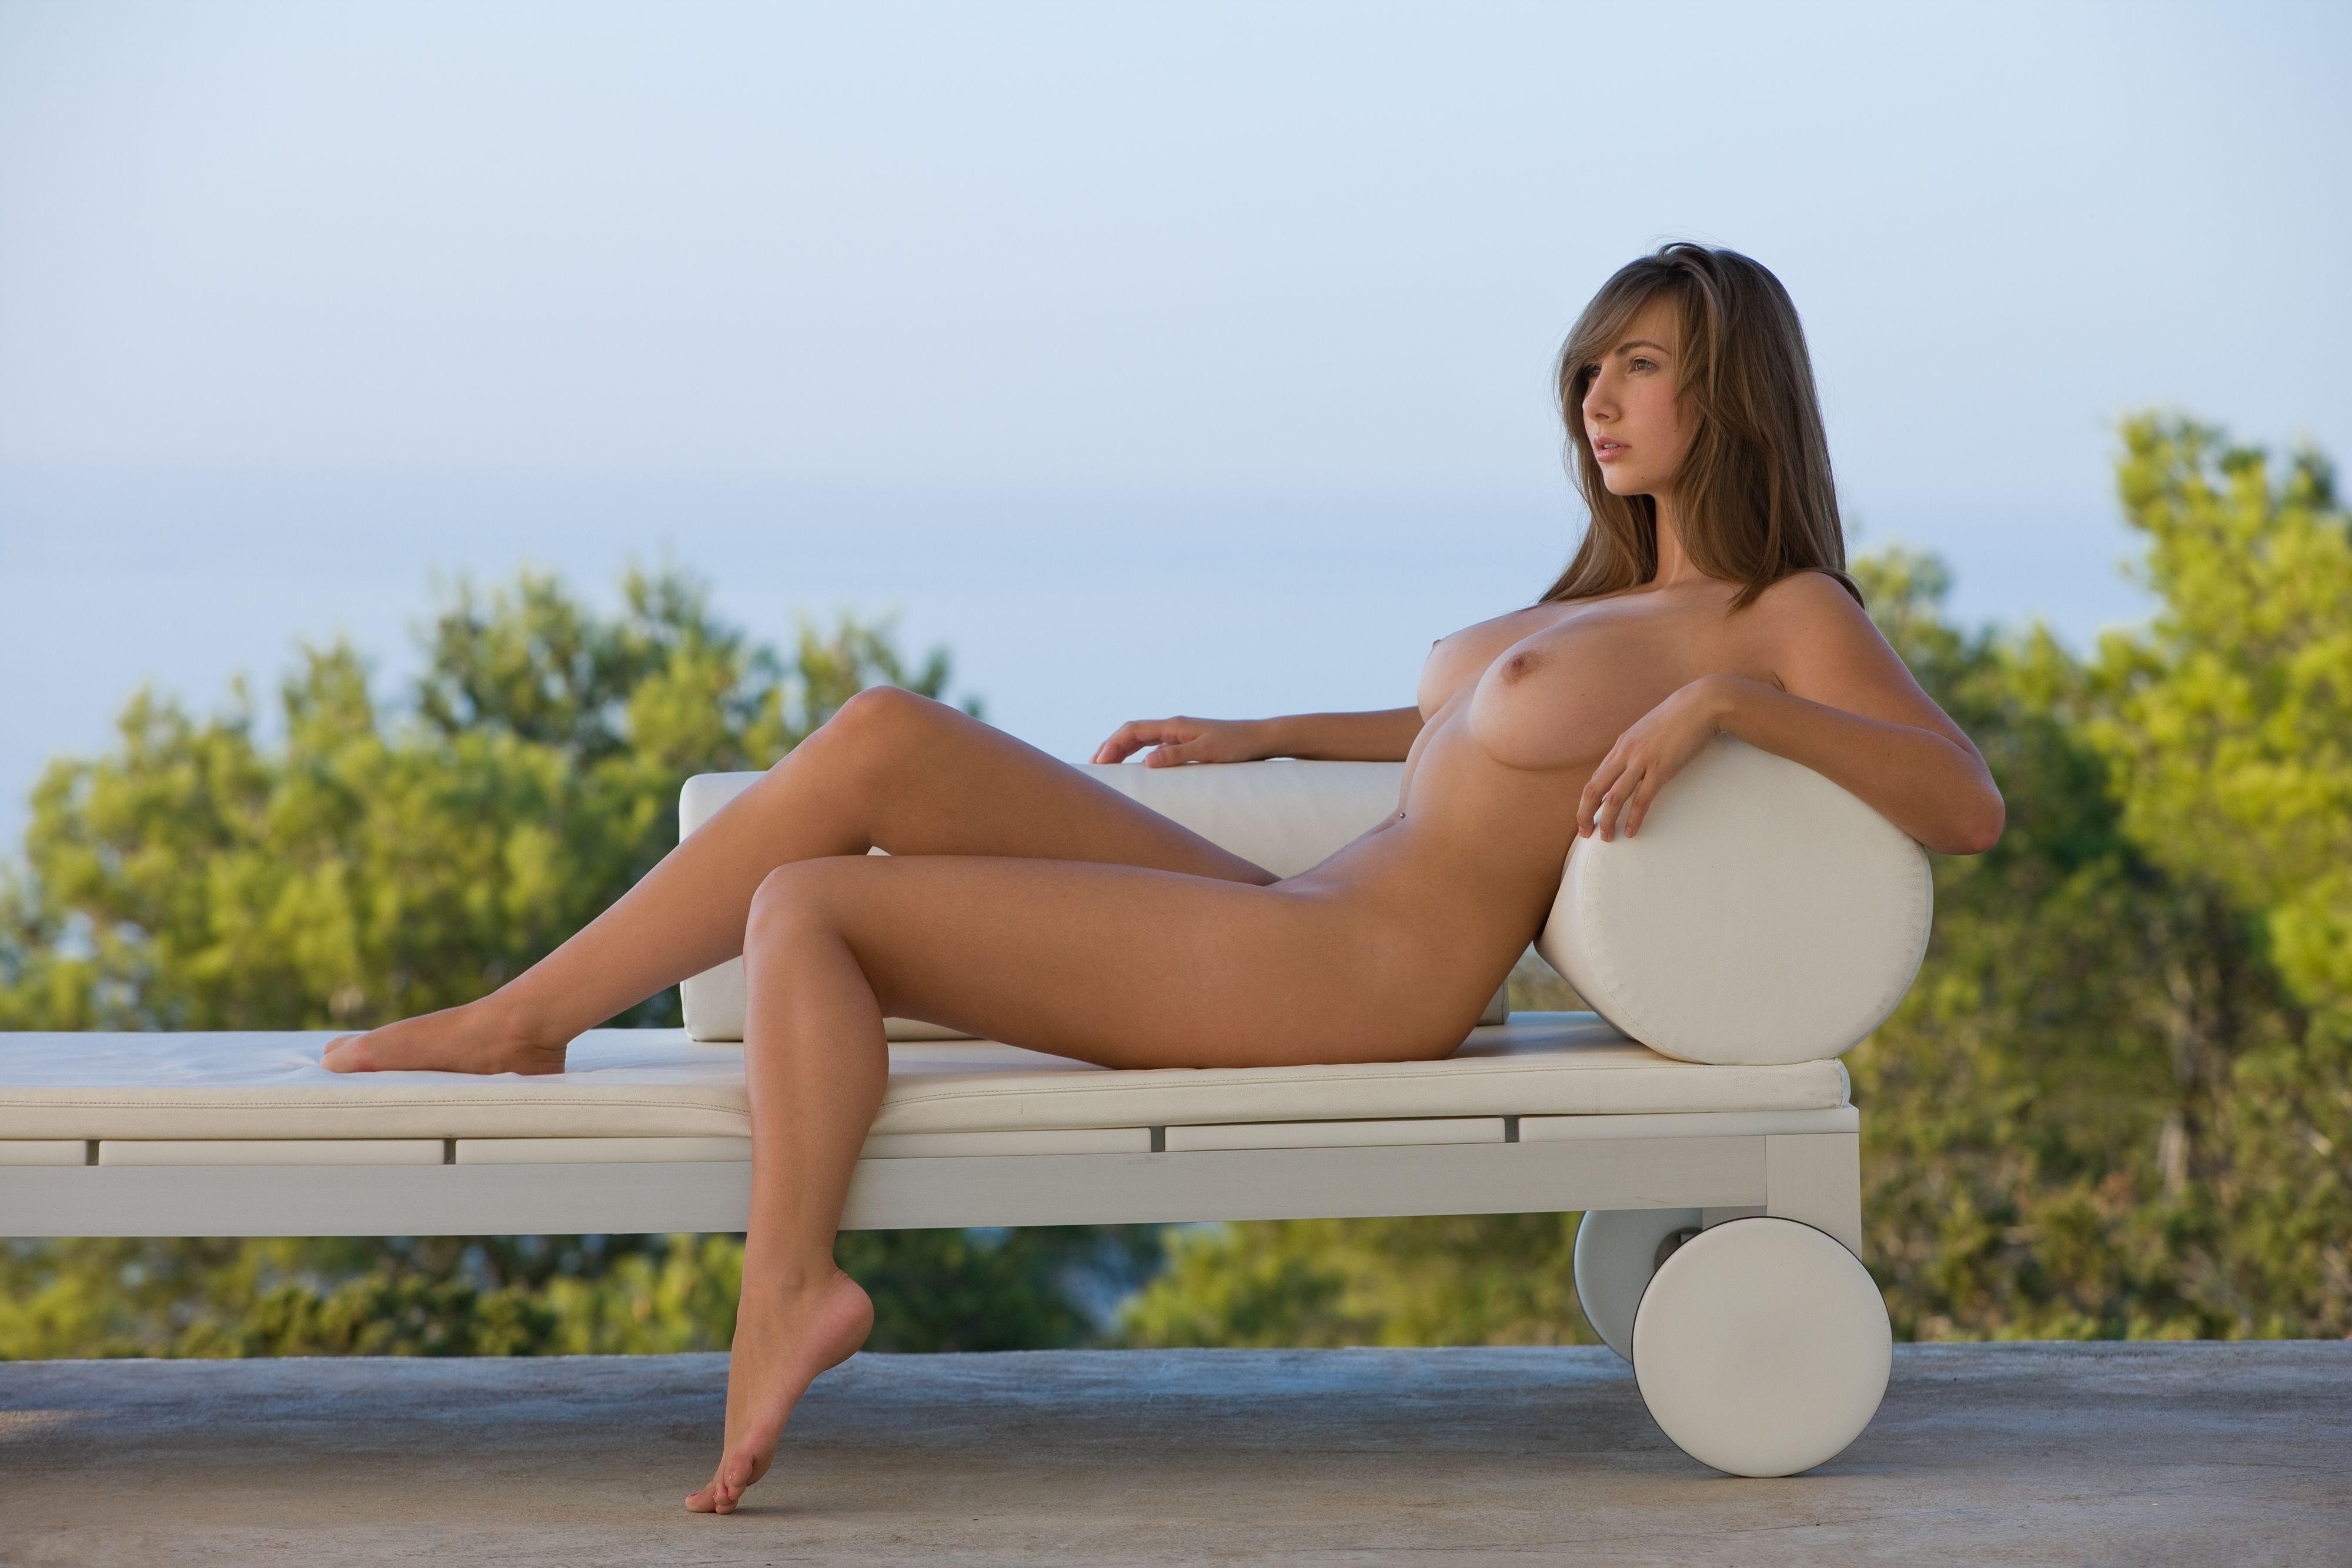 Alana De La Garza Nude, Topless Pictures, Playboy Photos, Sex Scene Uncensored